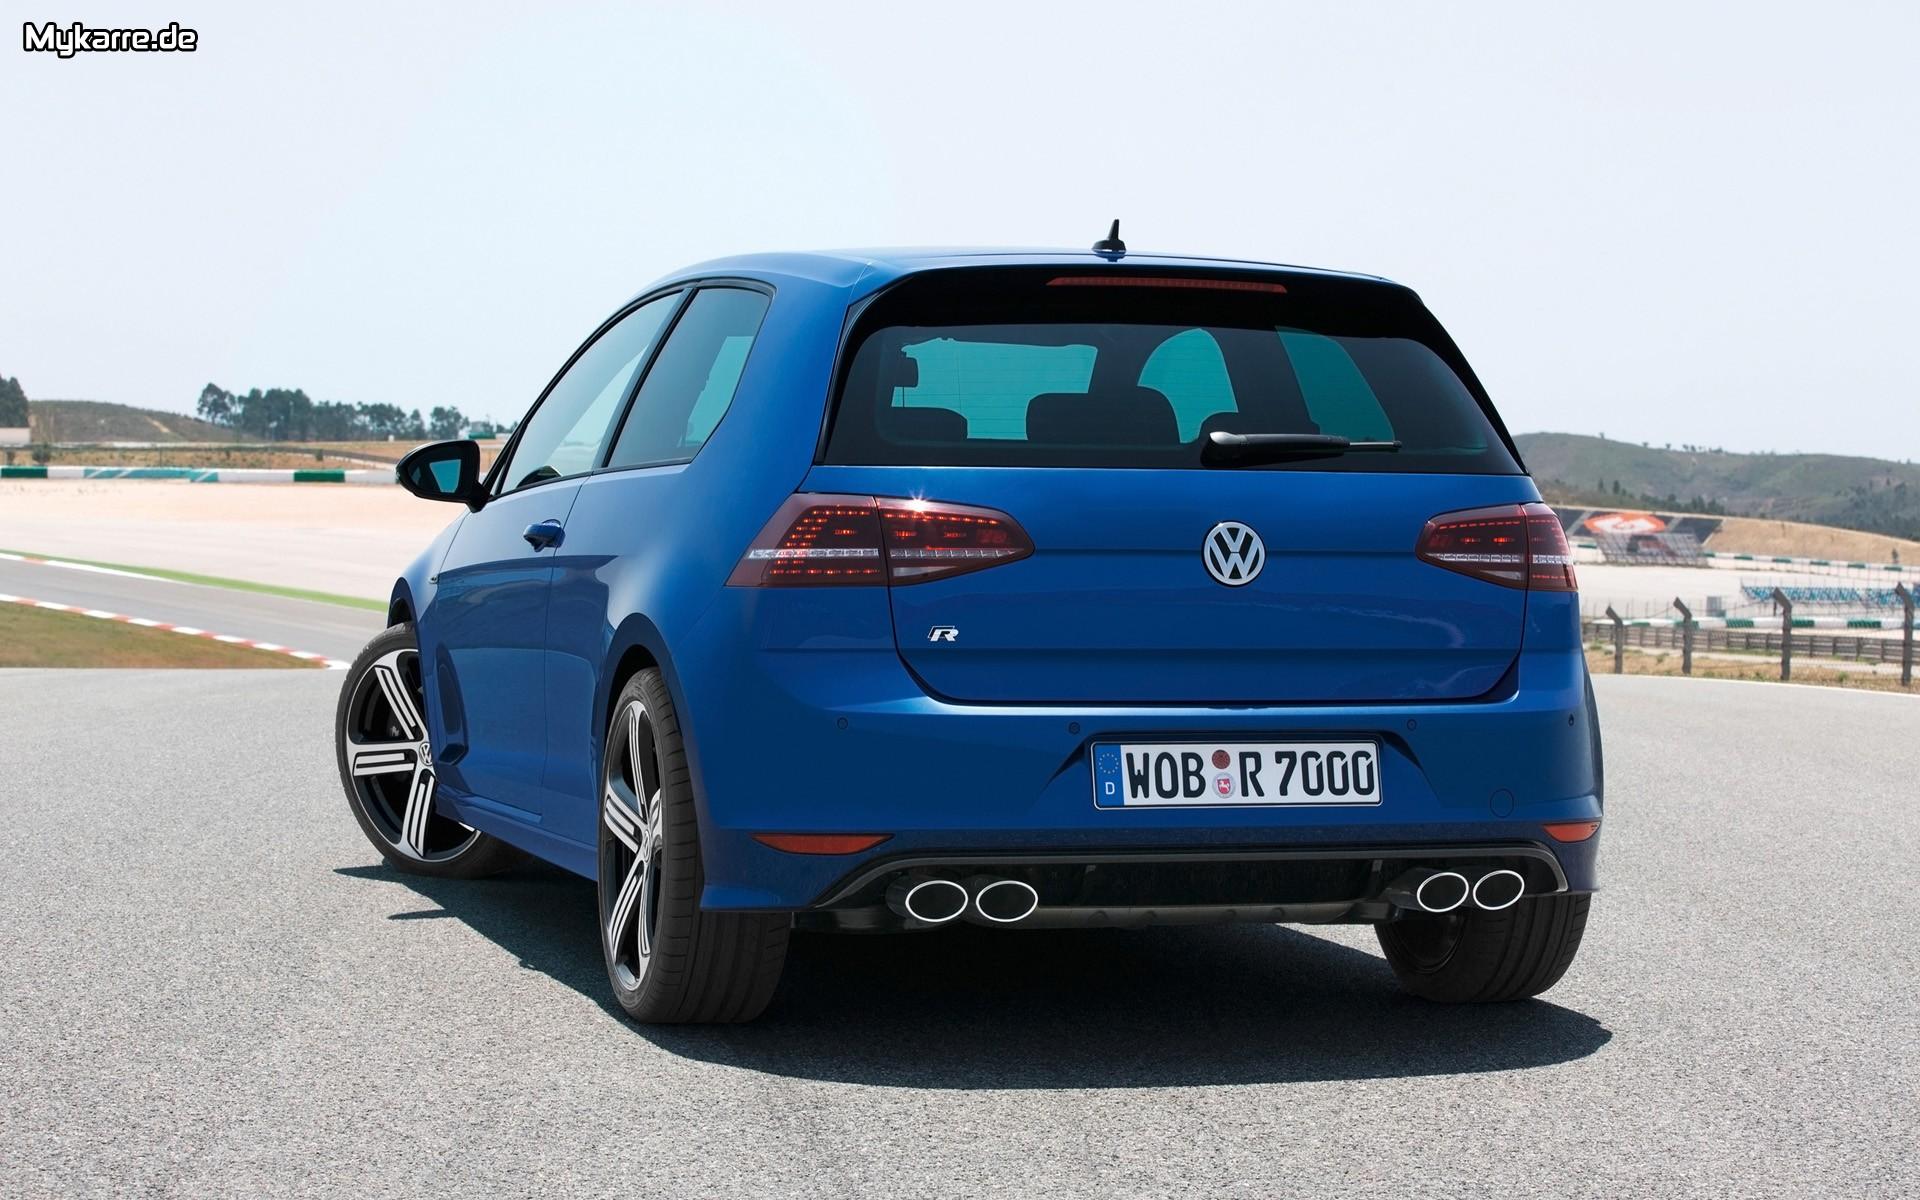 Volkswagen Golf R Wallpaper 2014 Heckansicht Auto Tuning News 1920x1200